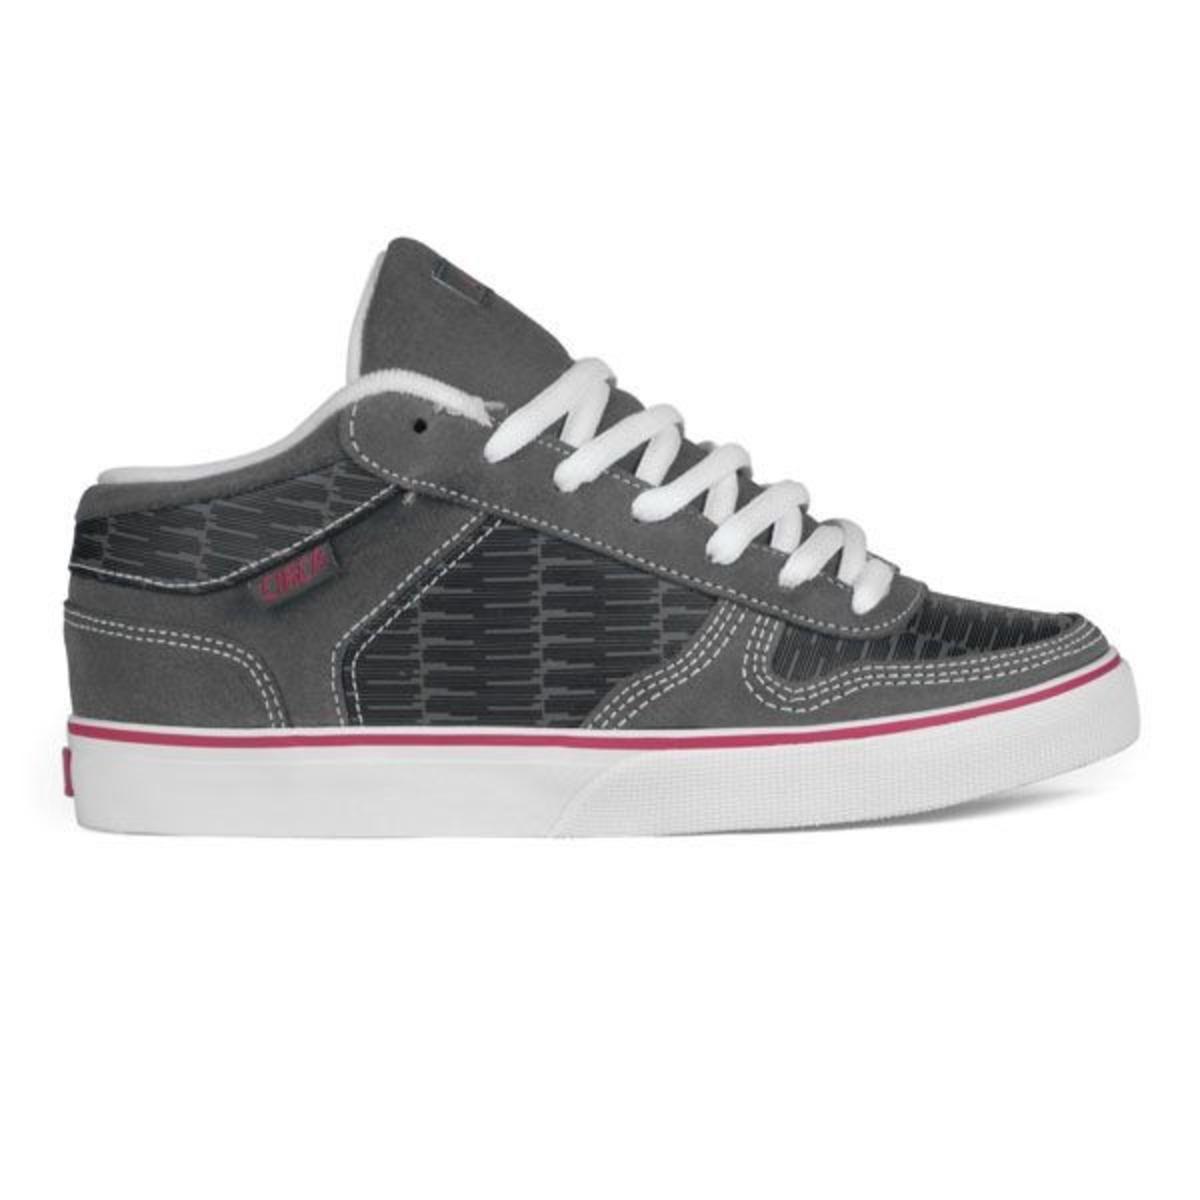 9249497ccd22 Circa 8 Track Skate Shoes Black   Gray   Hot Pink - Circa Shoes – Bild